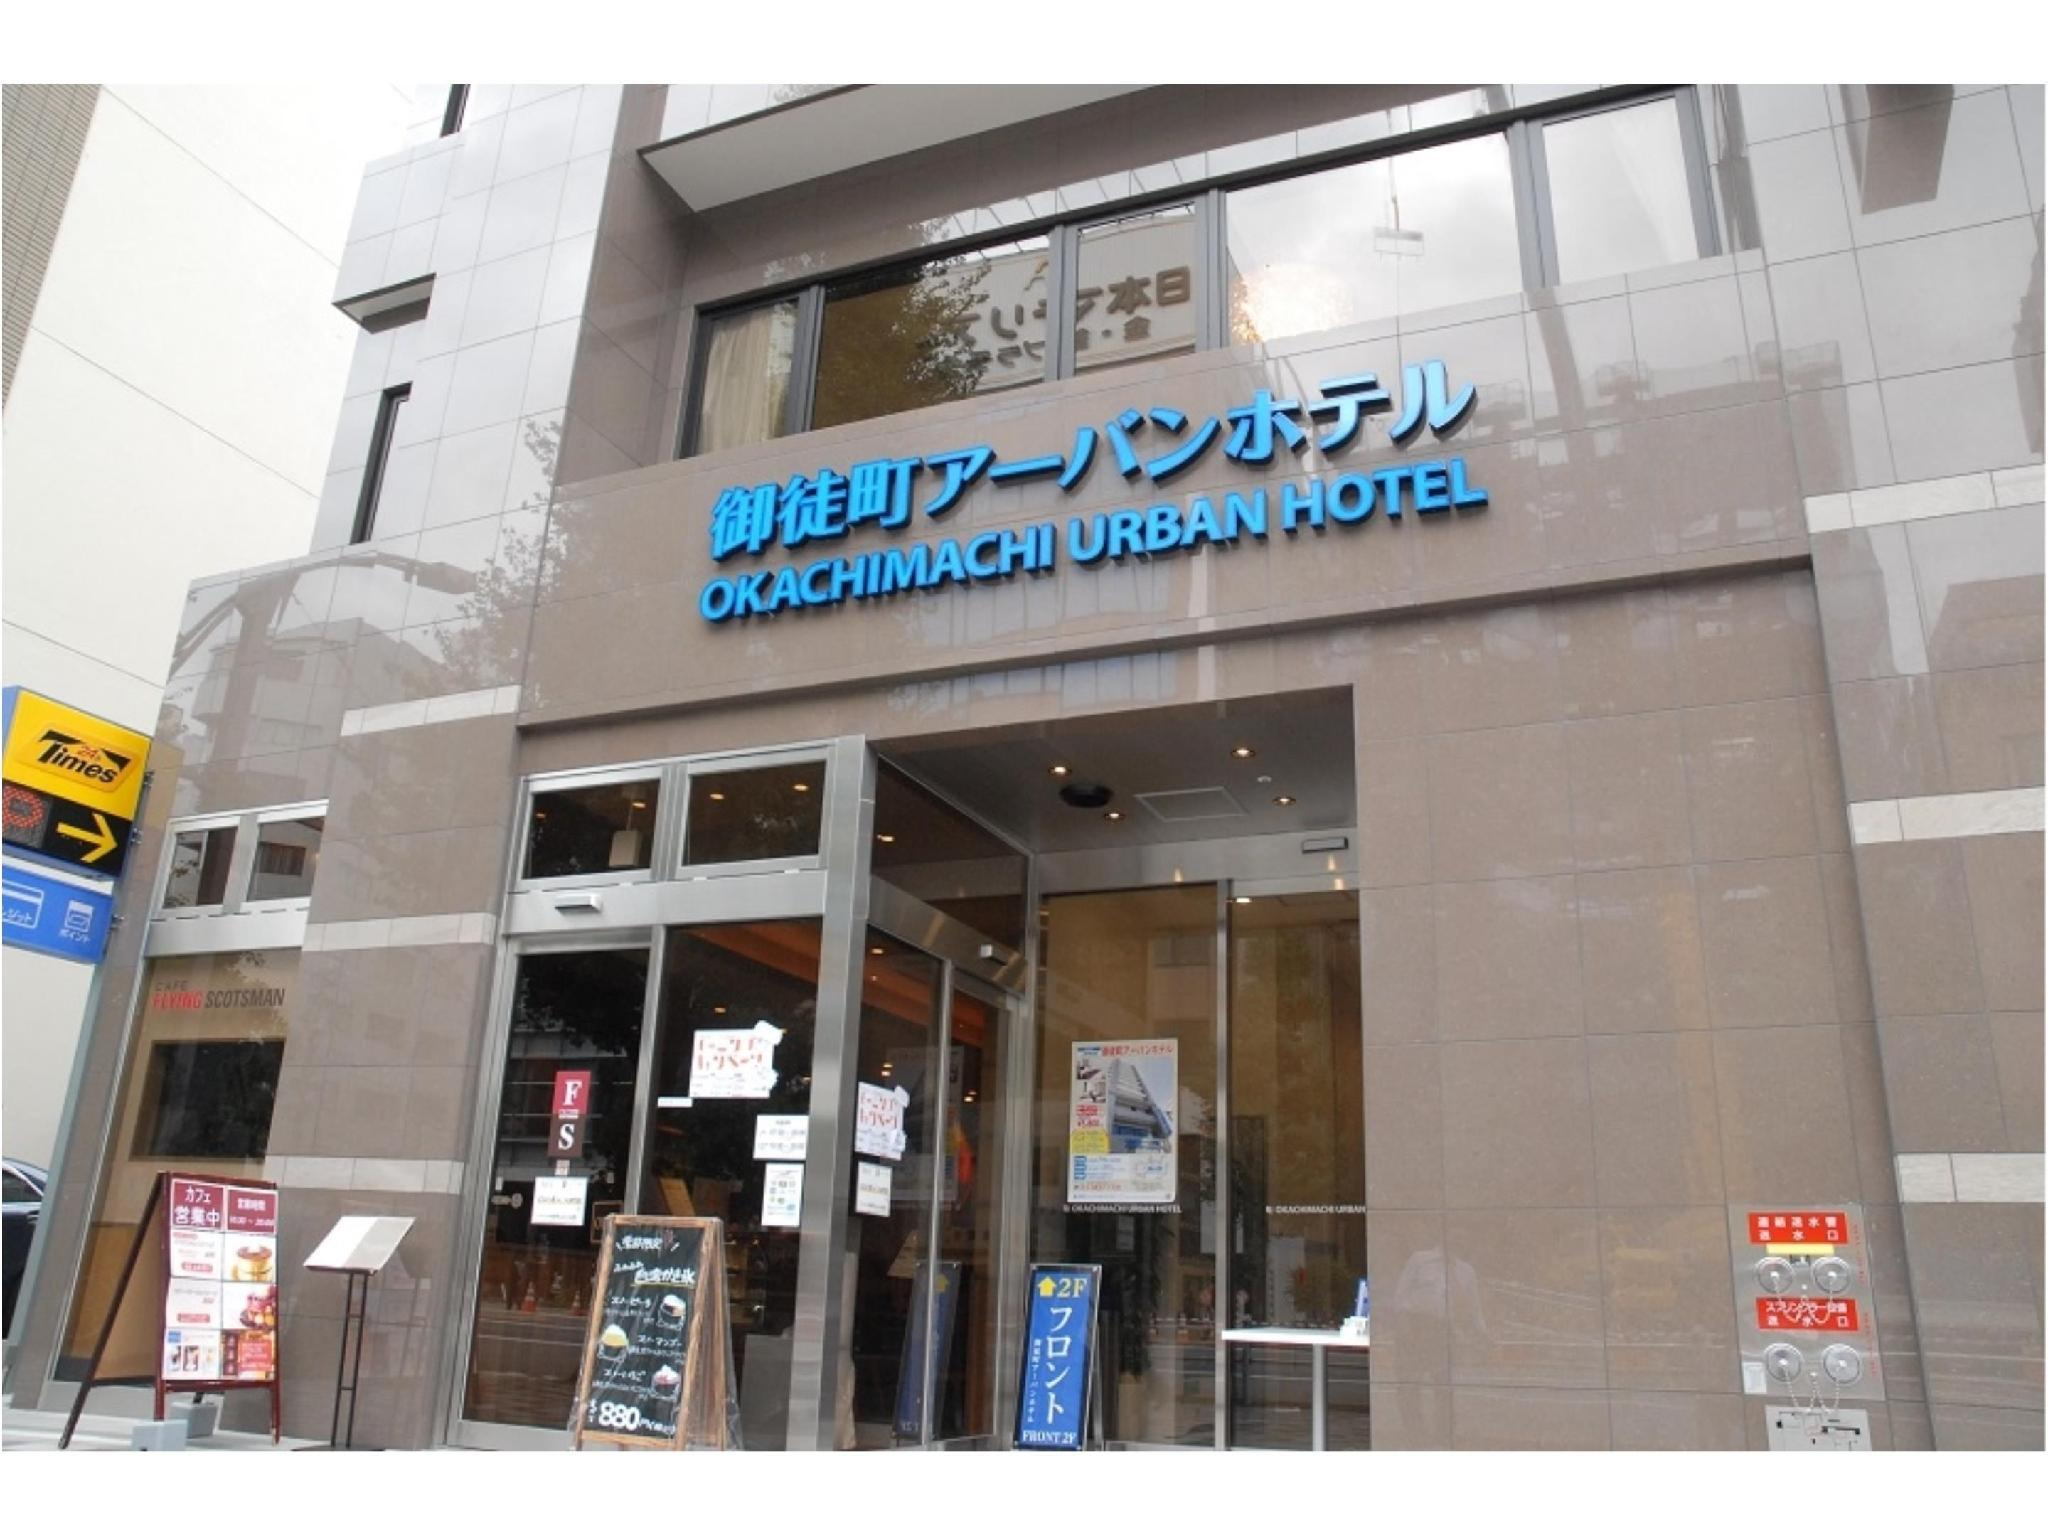 Okachimachi Urban Hotel